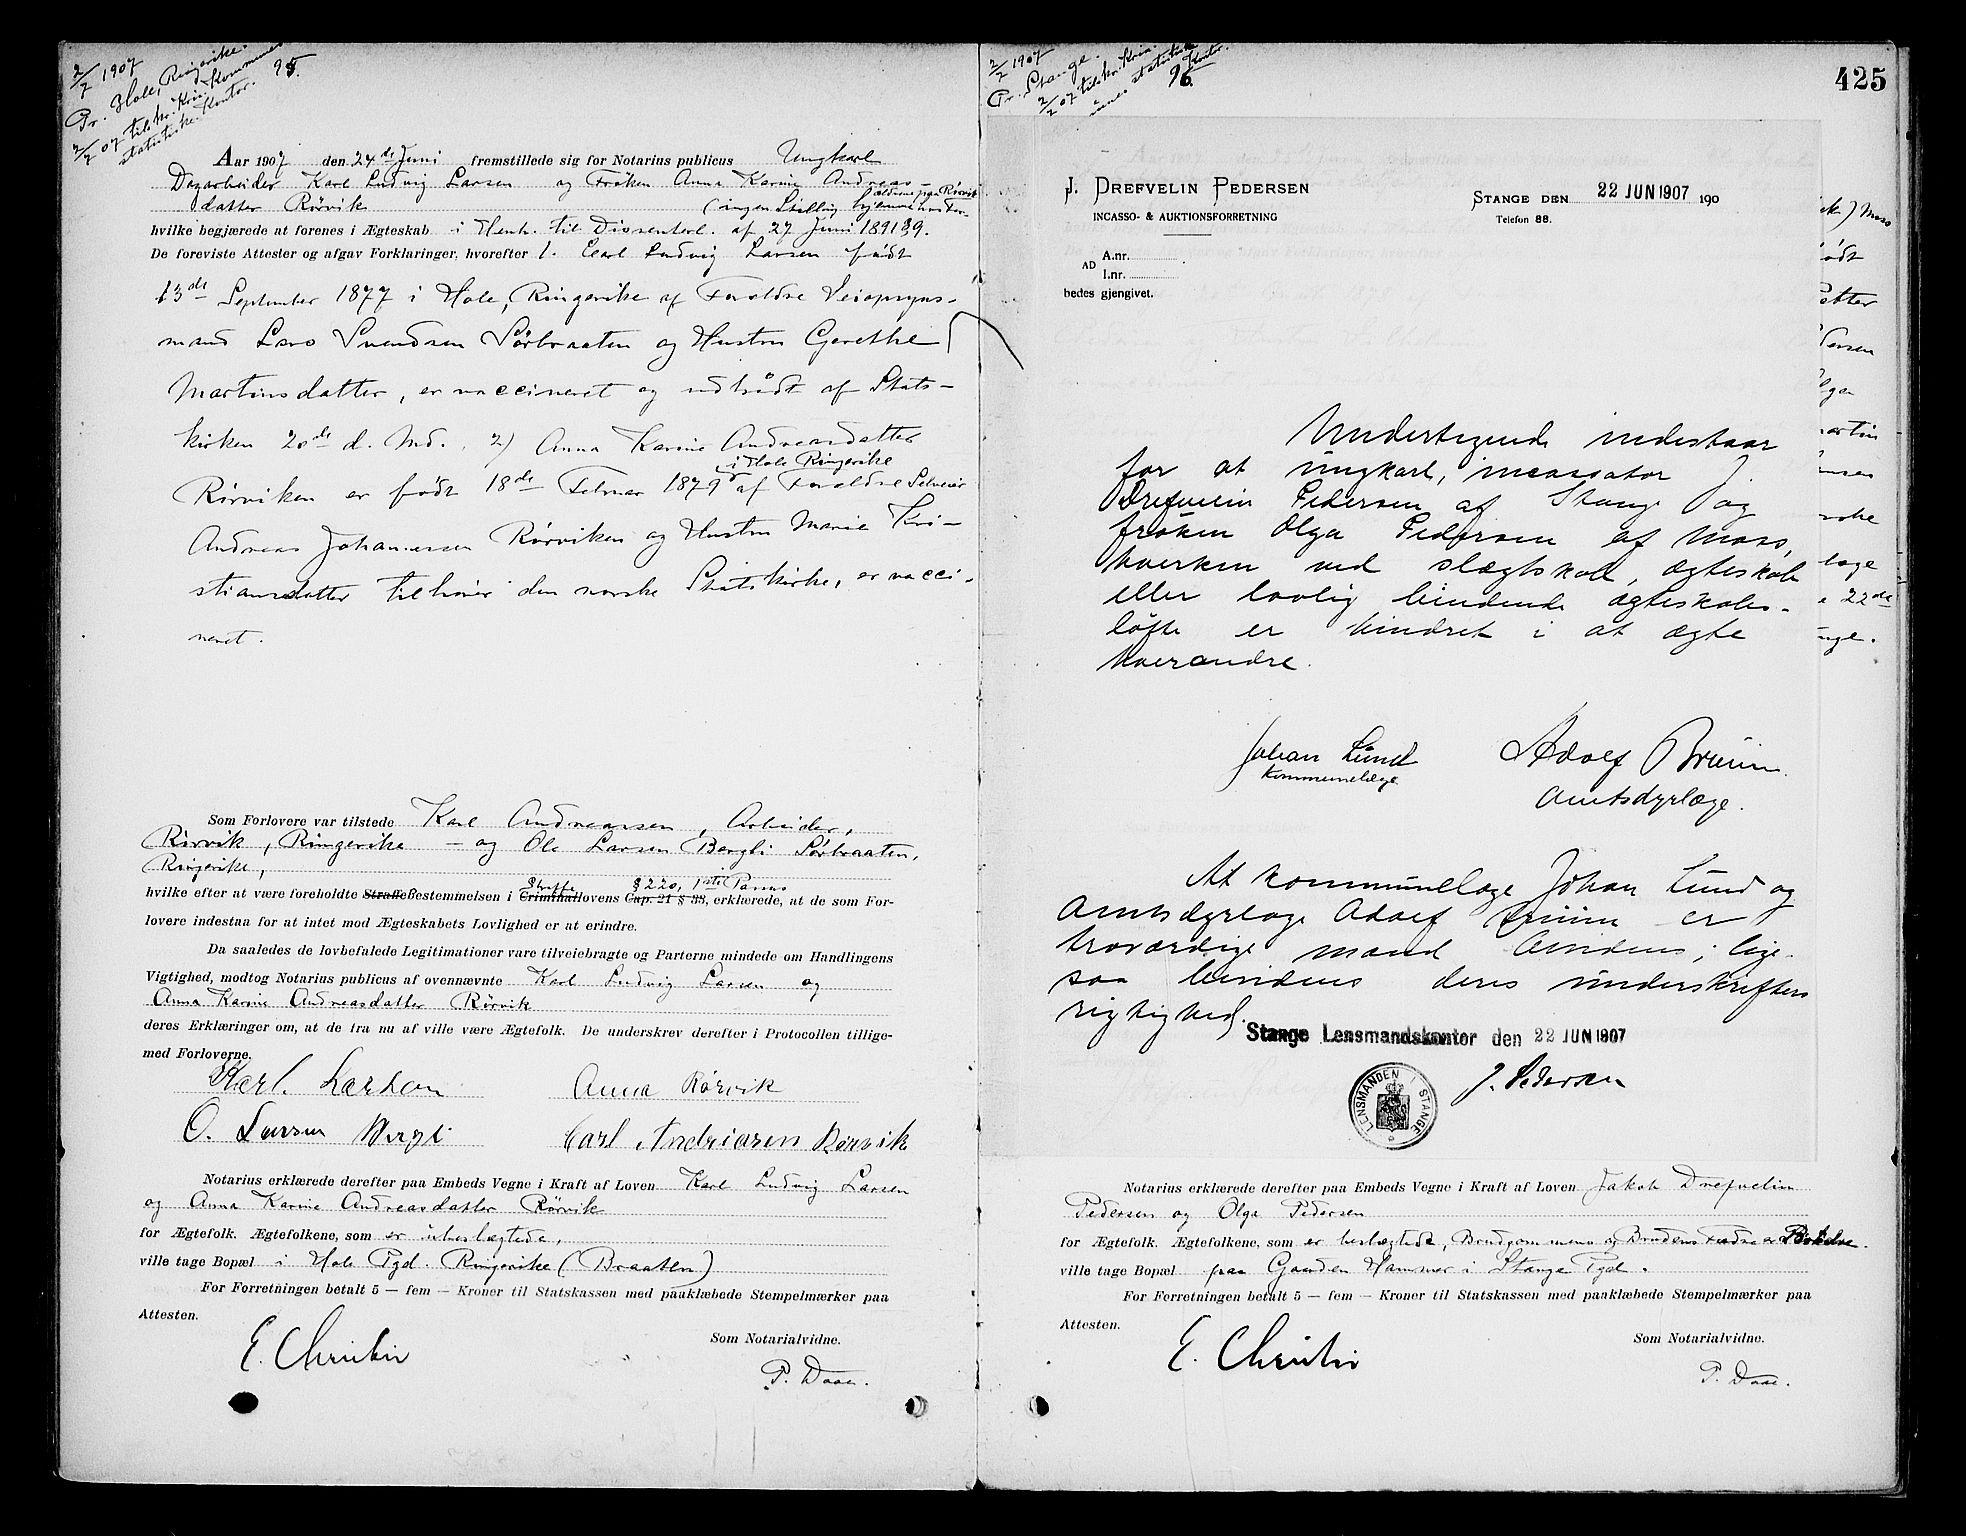 SAO, Oslo byfogd avd. I, L/Lb/Lbb/L0006: Notarialprotokoll, rekke II: Vigsler, 1902-1907, s. 424b-425a